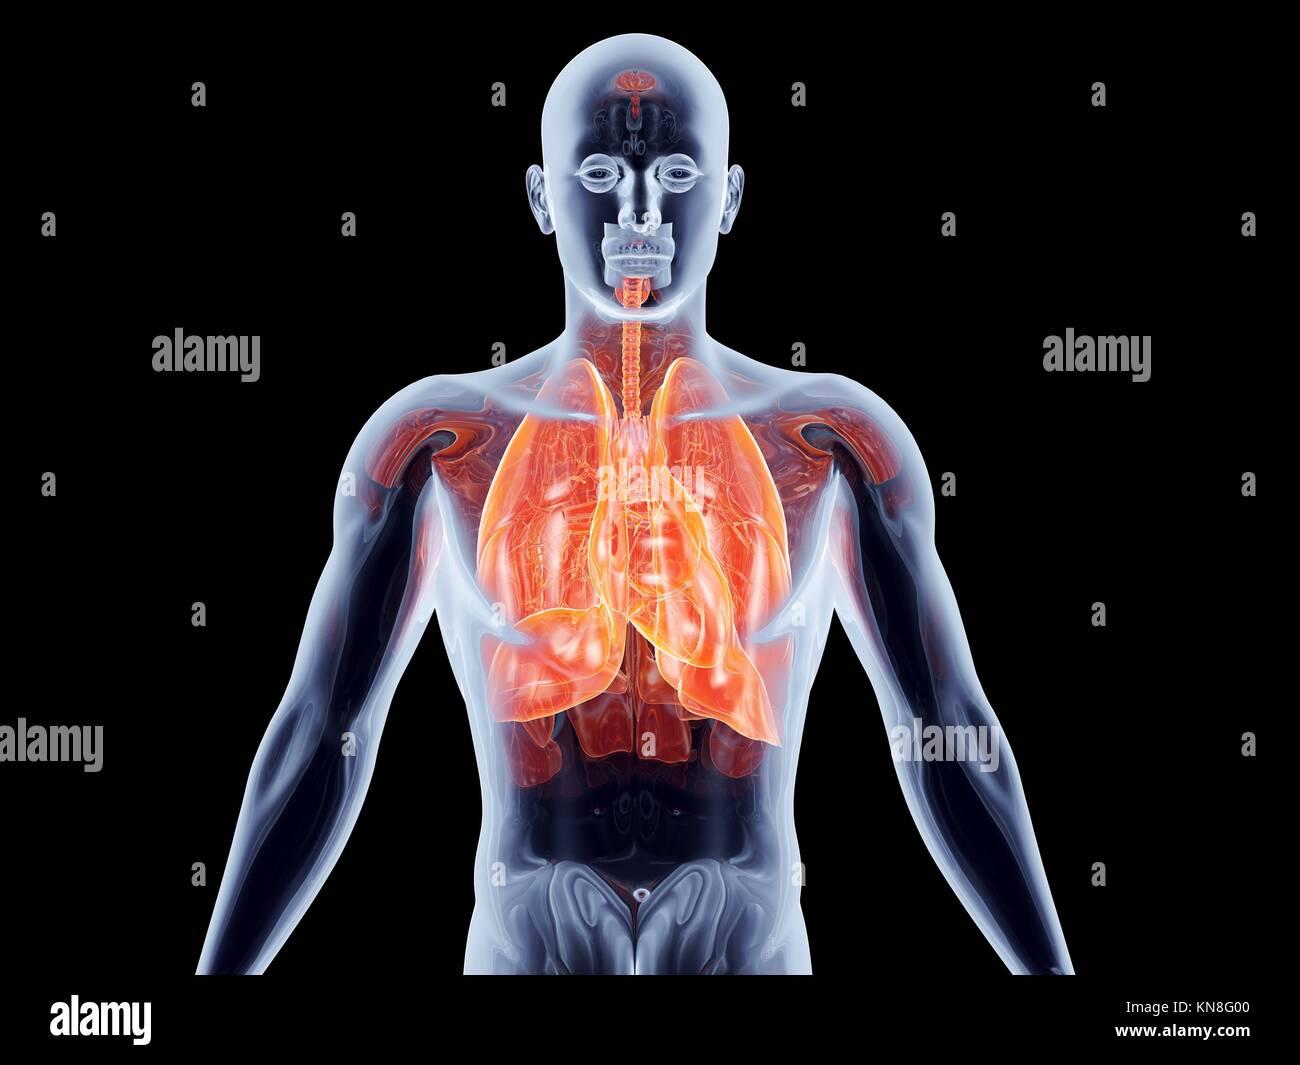 Inhale Medicine Stockfotos & Inhale Medicine Bilder - Alamy